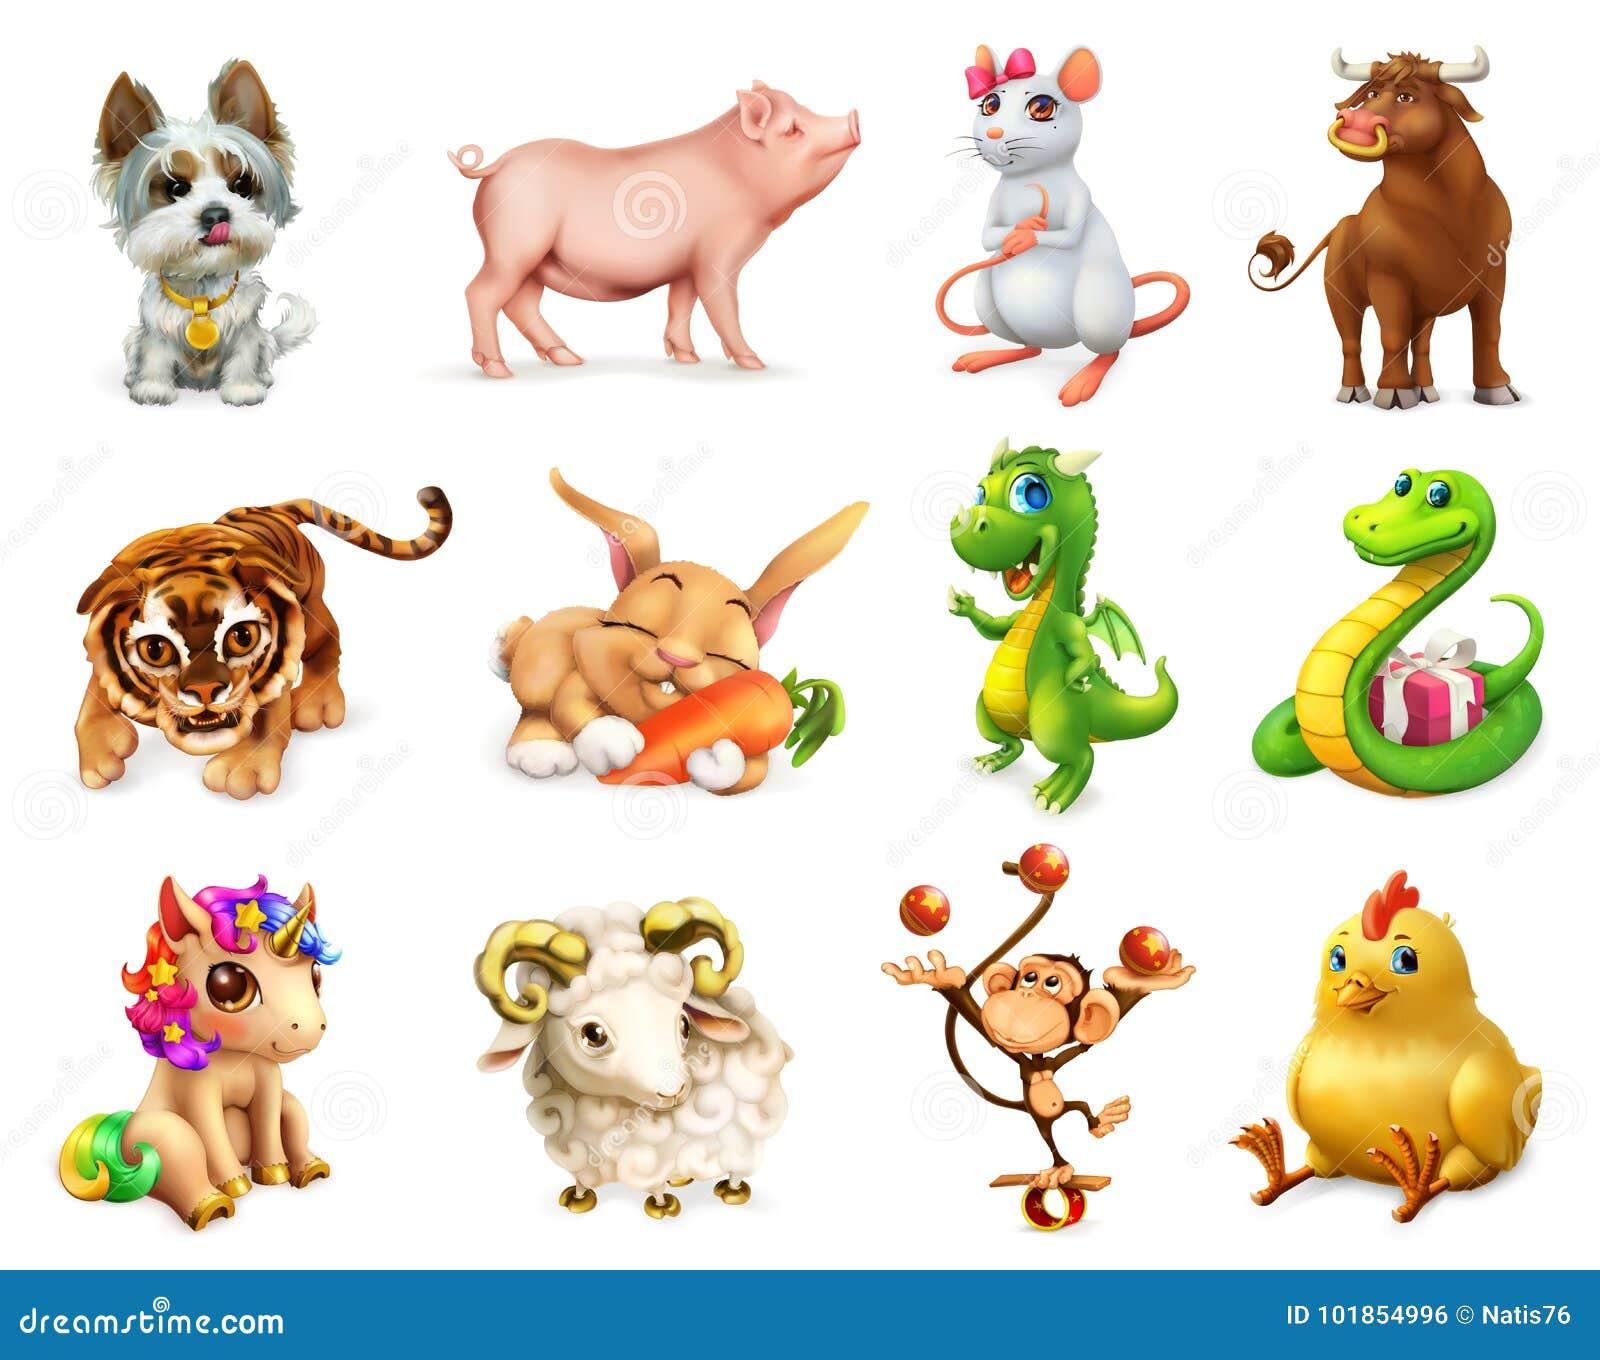 Calendario Zodiacale Cinese.Animale Divertente Nello Zodiaco Cinese Calendario Cinese